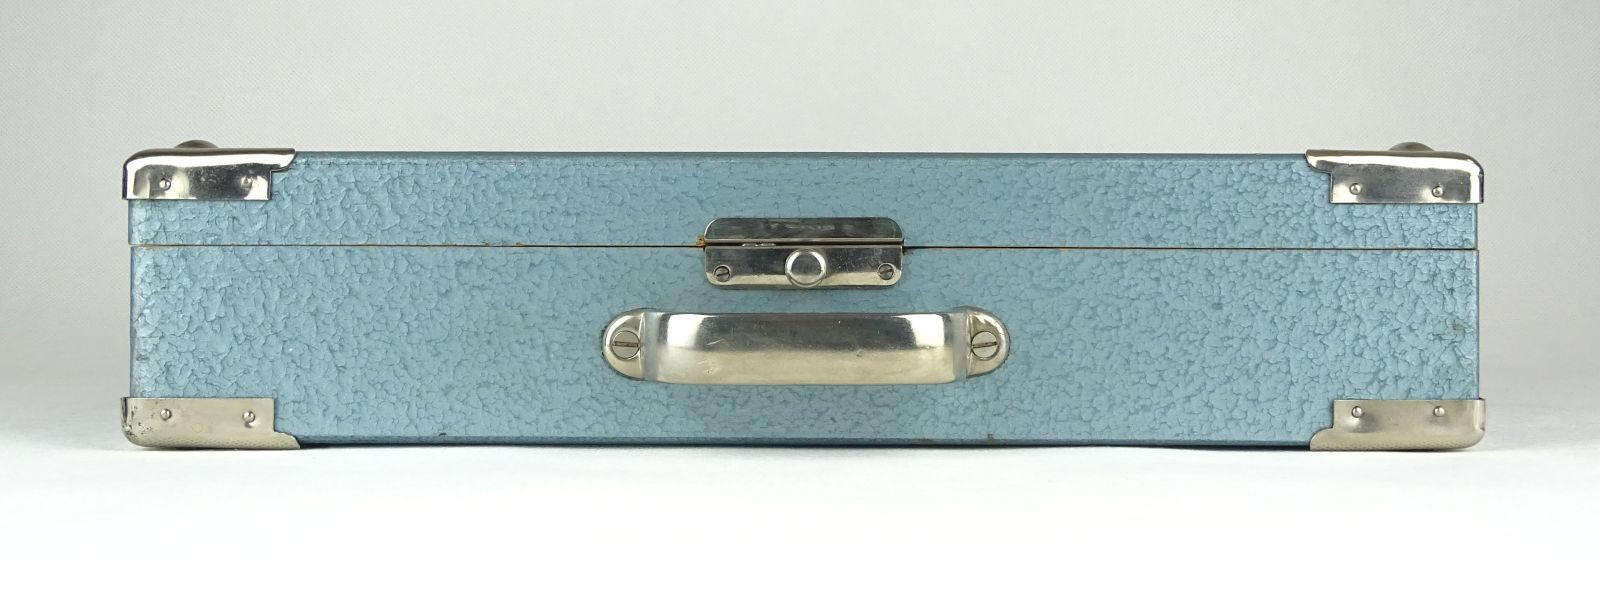 DSC03557.JPG (1600×603)